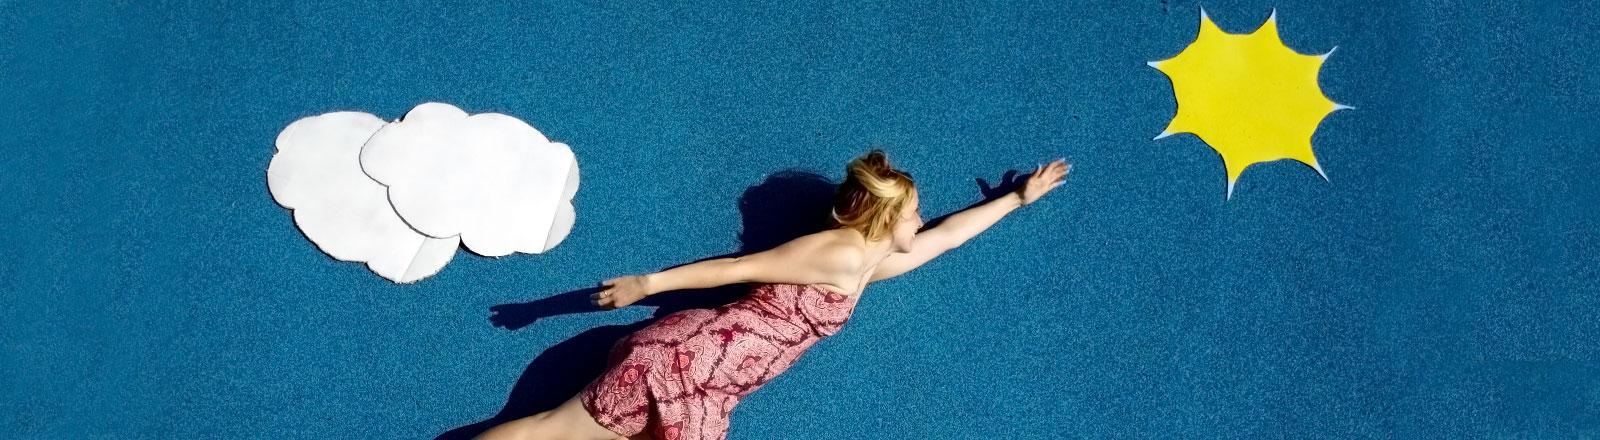 Eine Frau fliegt Richtung Sonne.